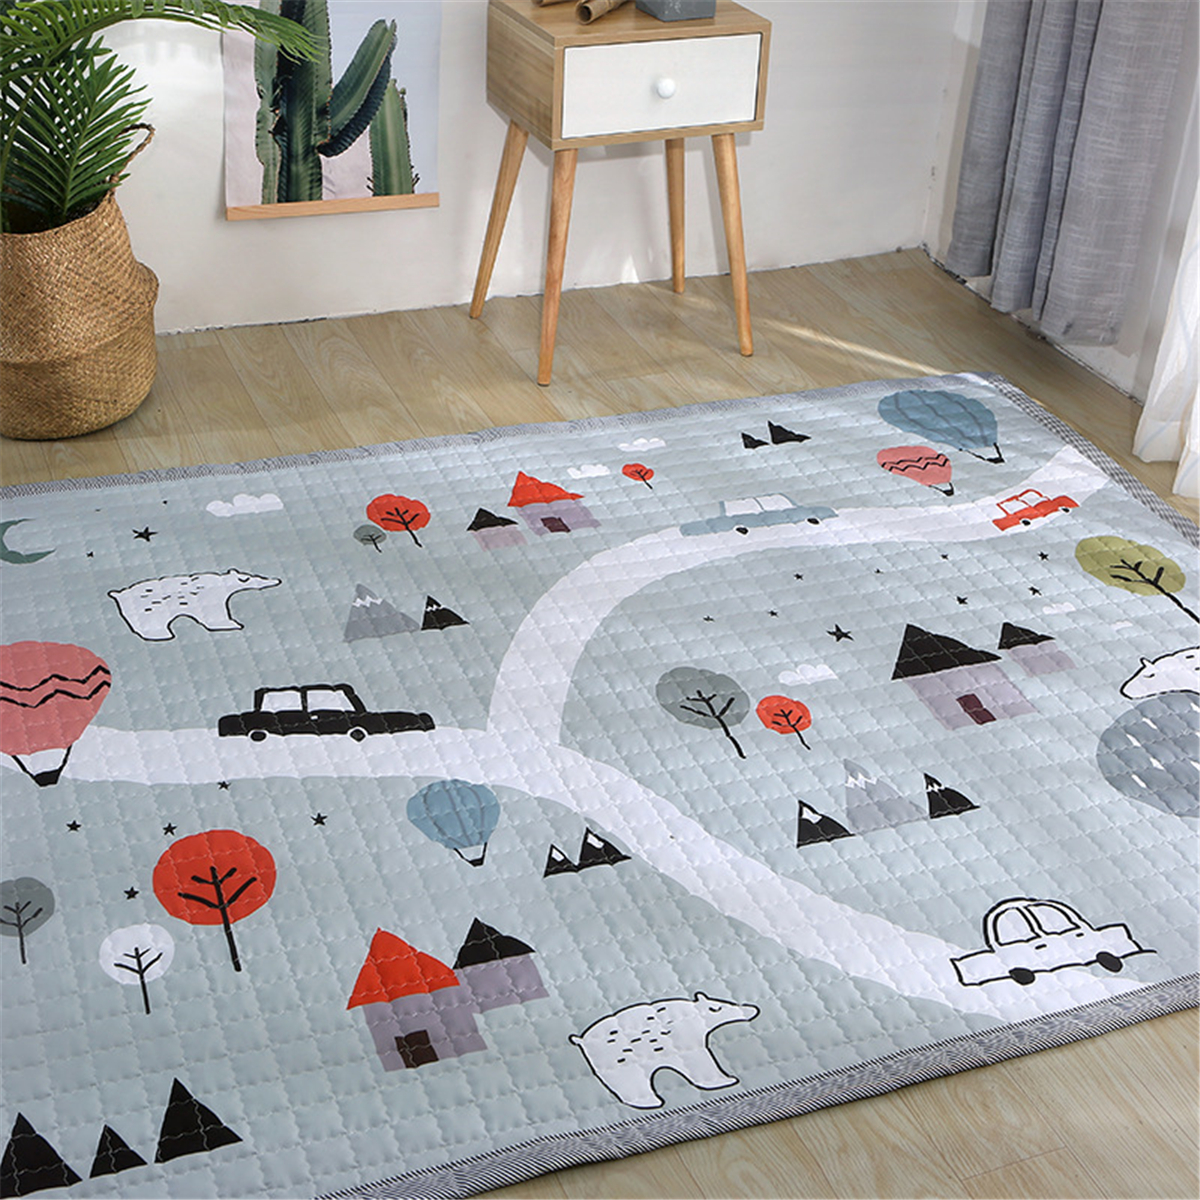 Polyester Baby Play Mat Crawling Kids Game Gym Activity Carpet Blanket Floor Rug